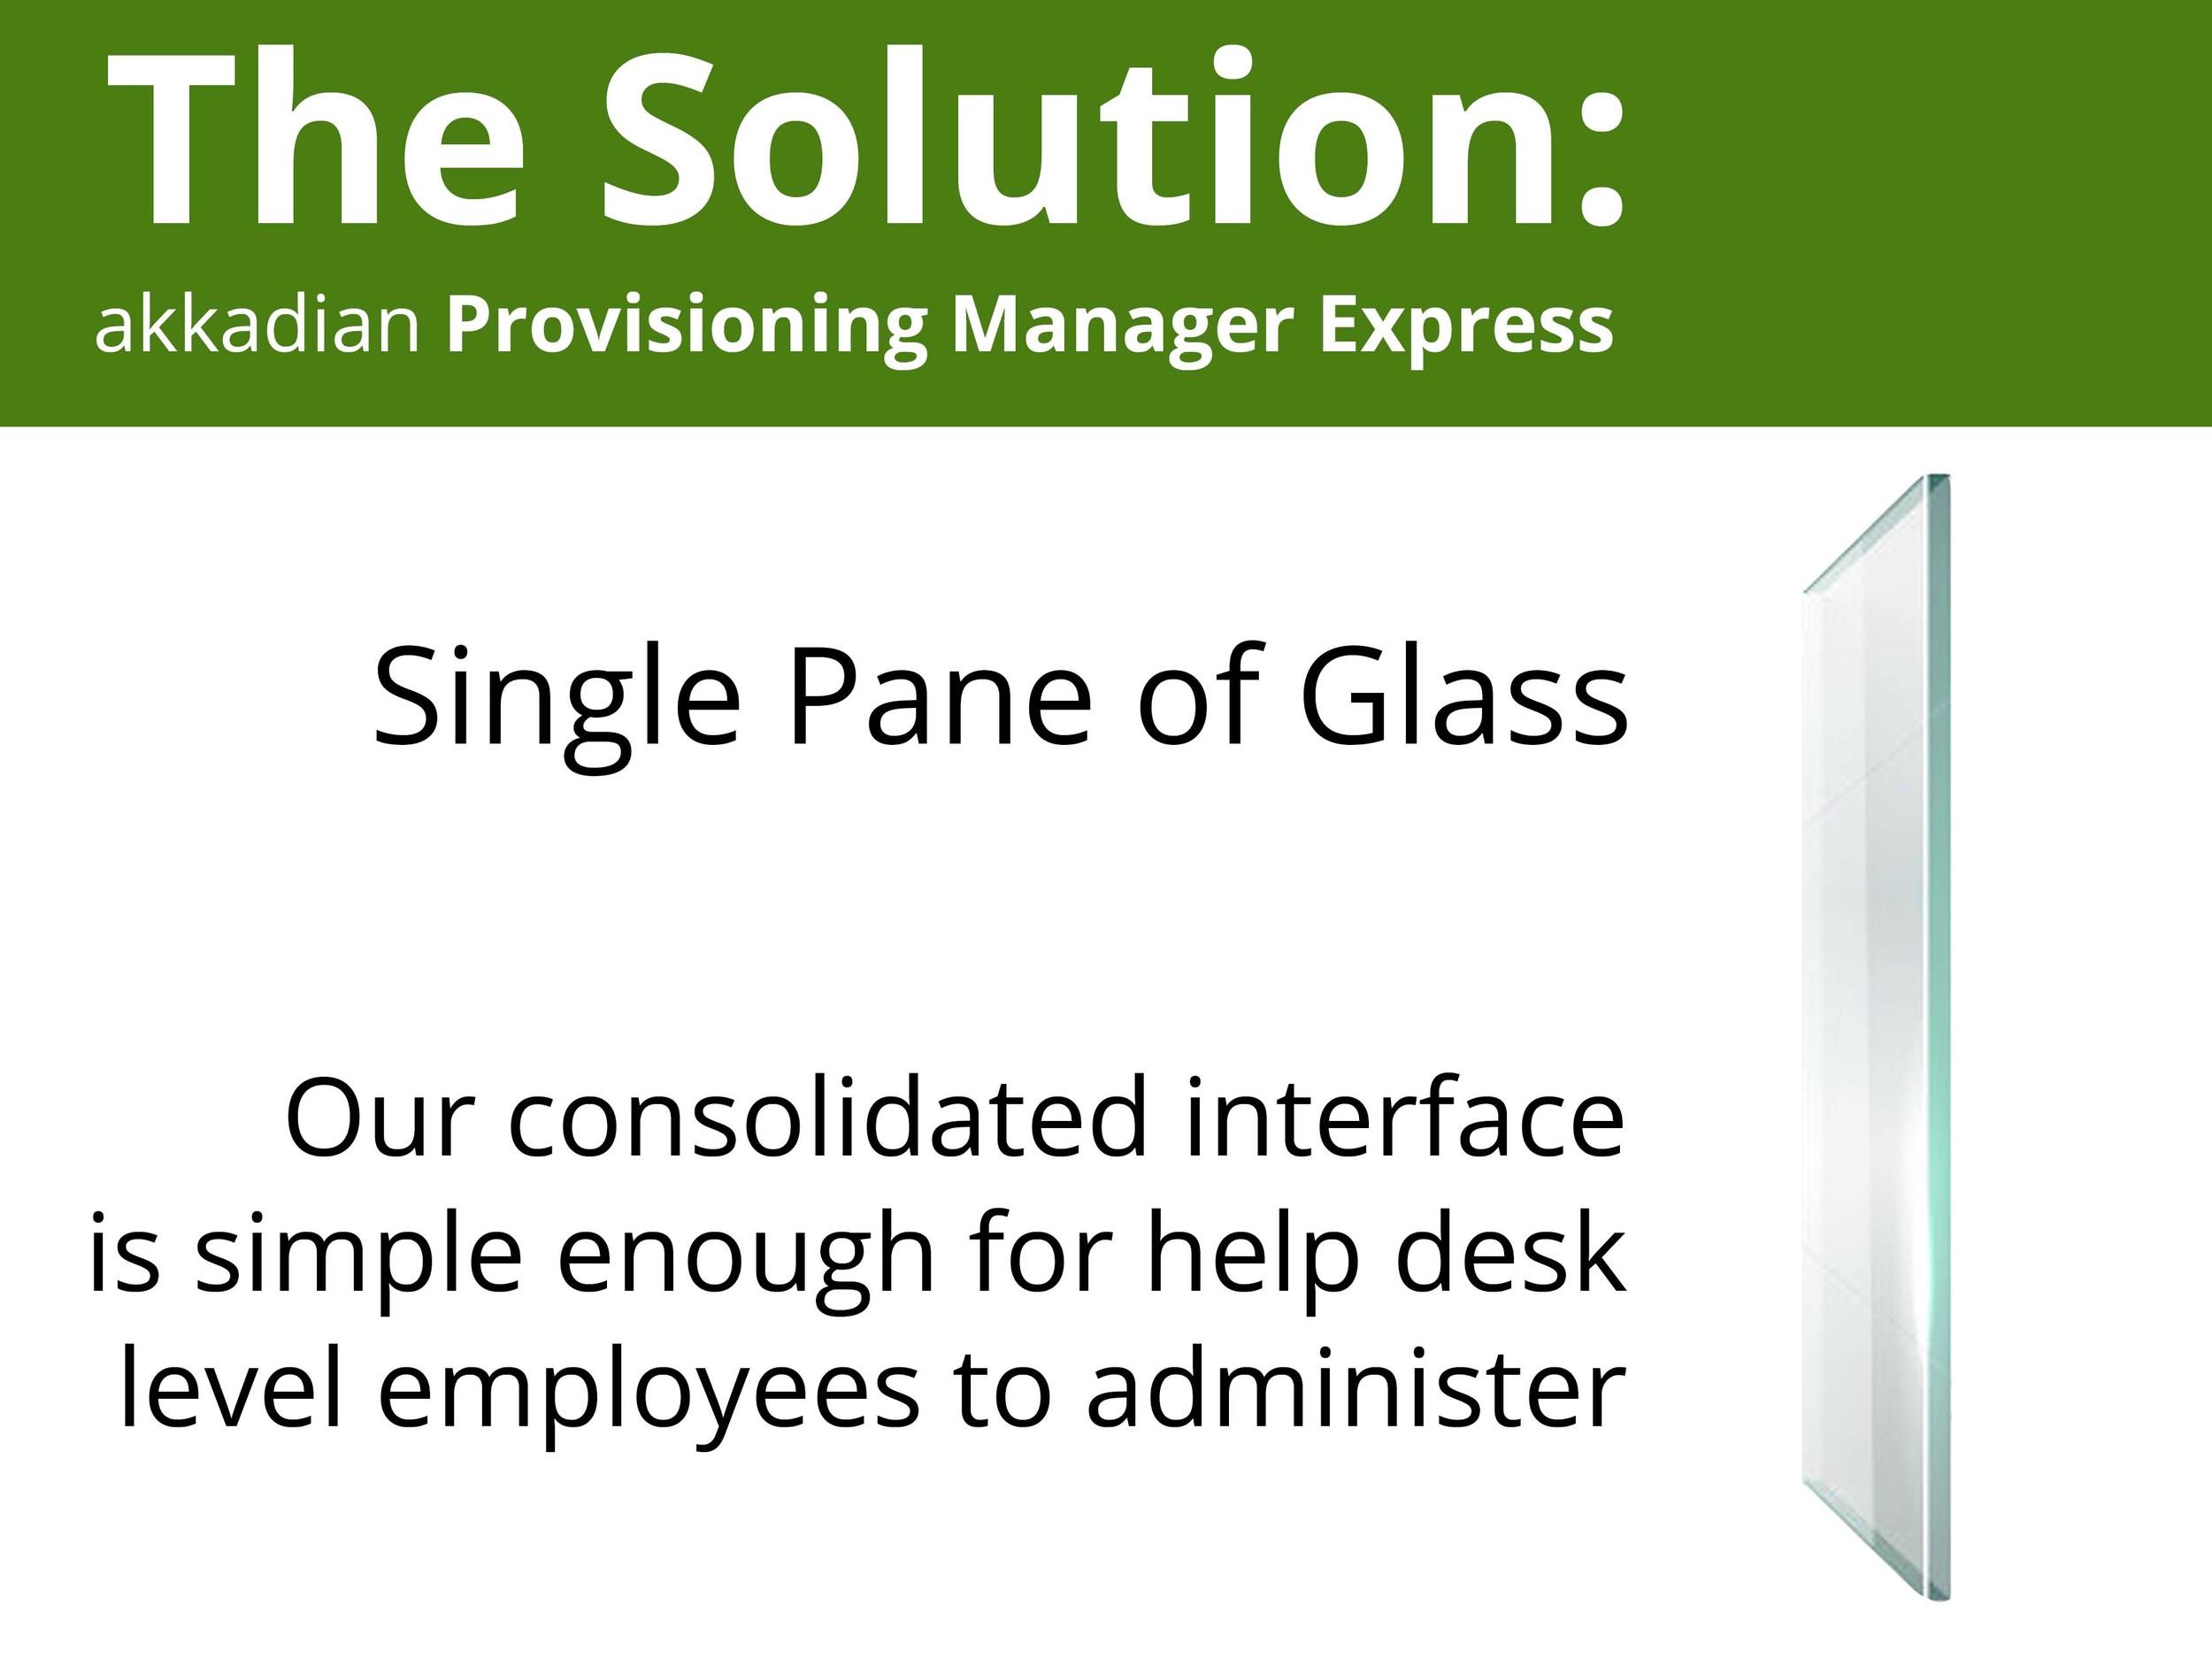 b2b presentation on provisioning solution single pane of glass.jpg